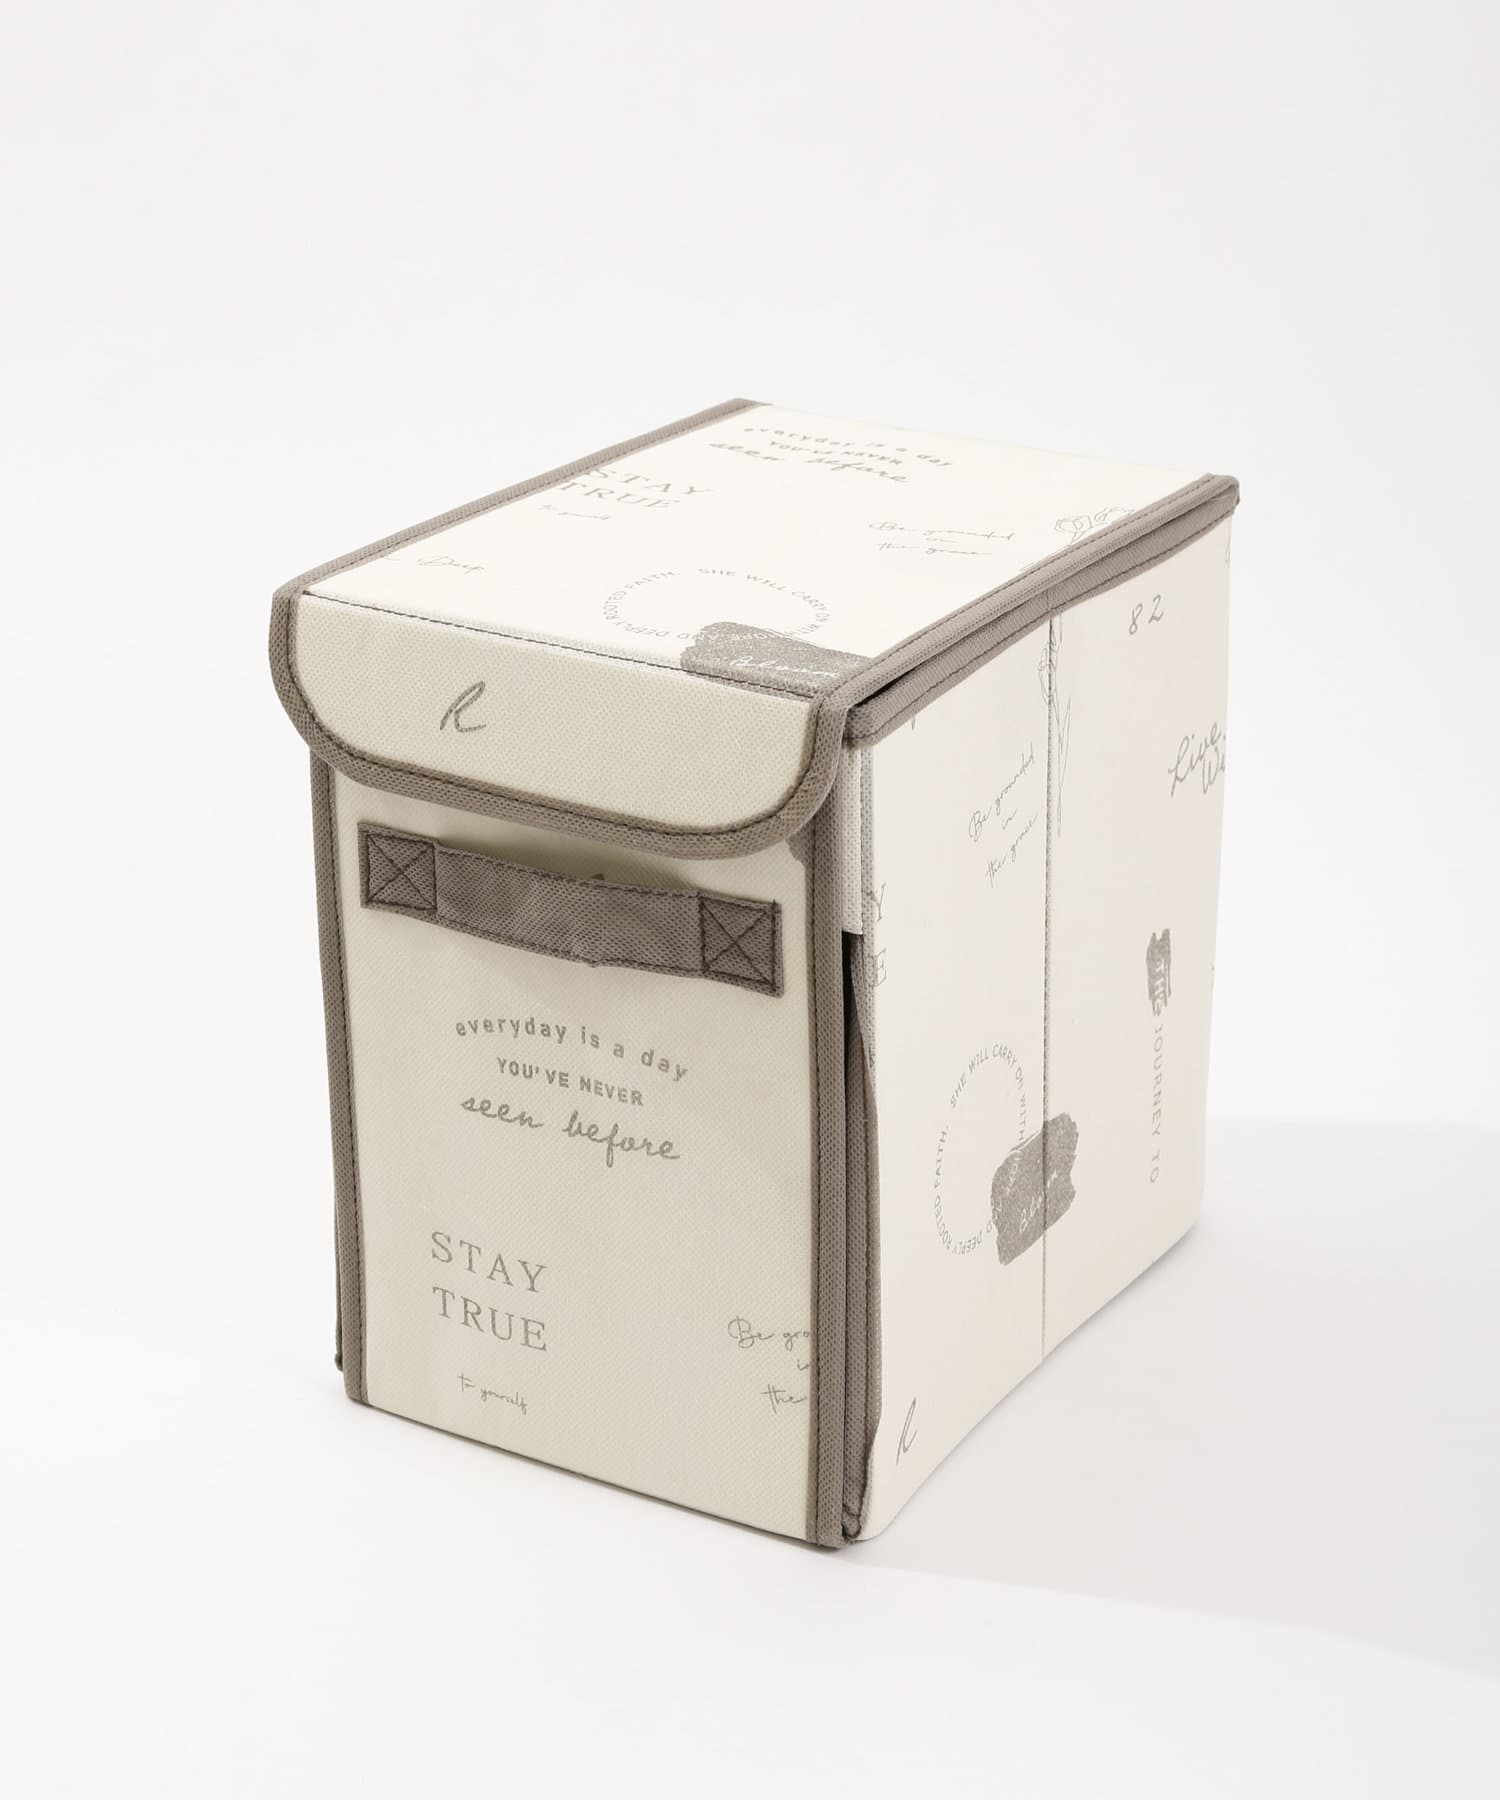 3COINS(スリーコインズ) ライフスタイル 【一部大型店舗限定】フタ付前開き収納BOX アイボリー